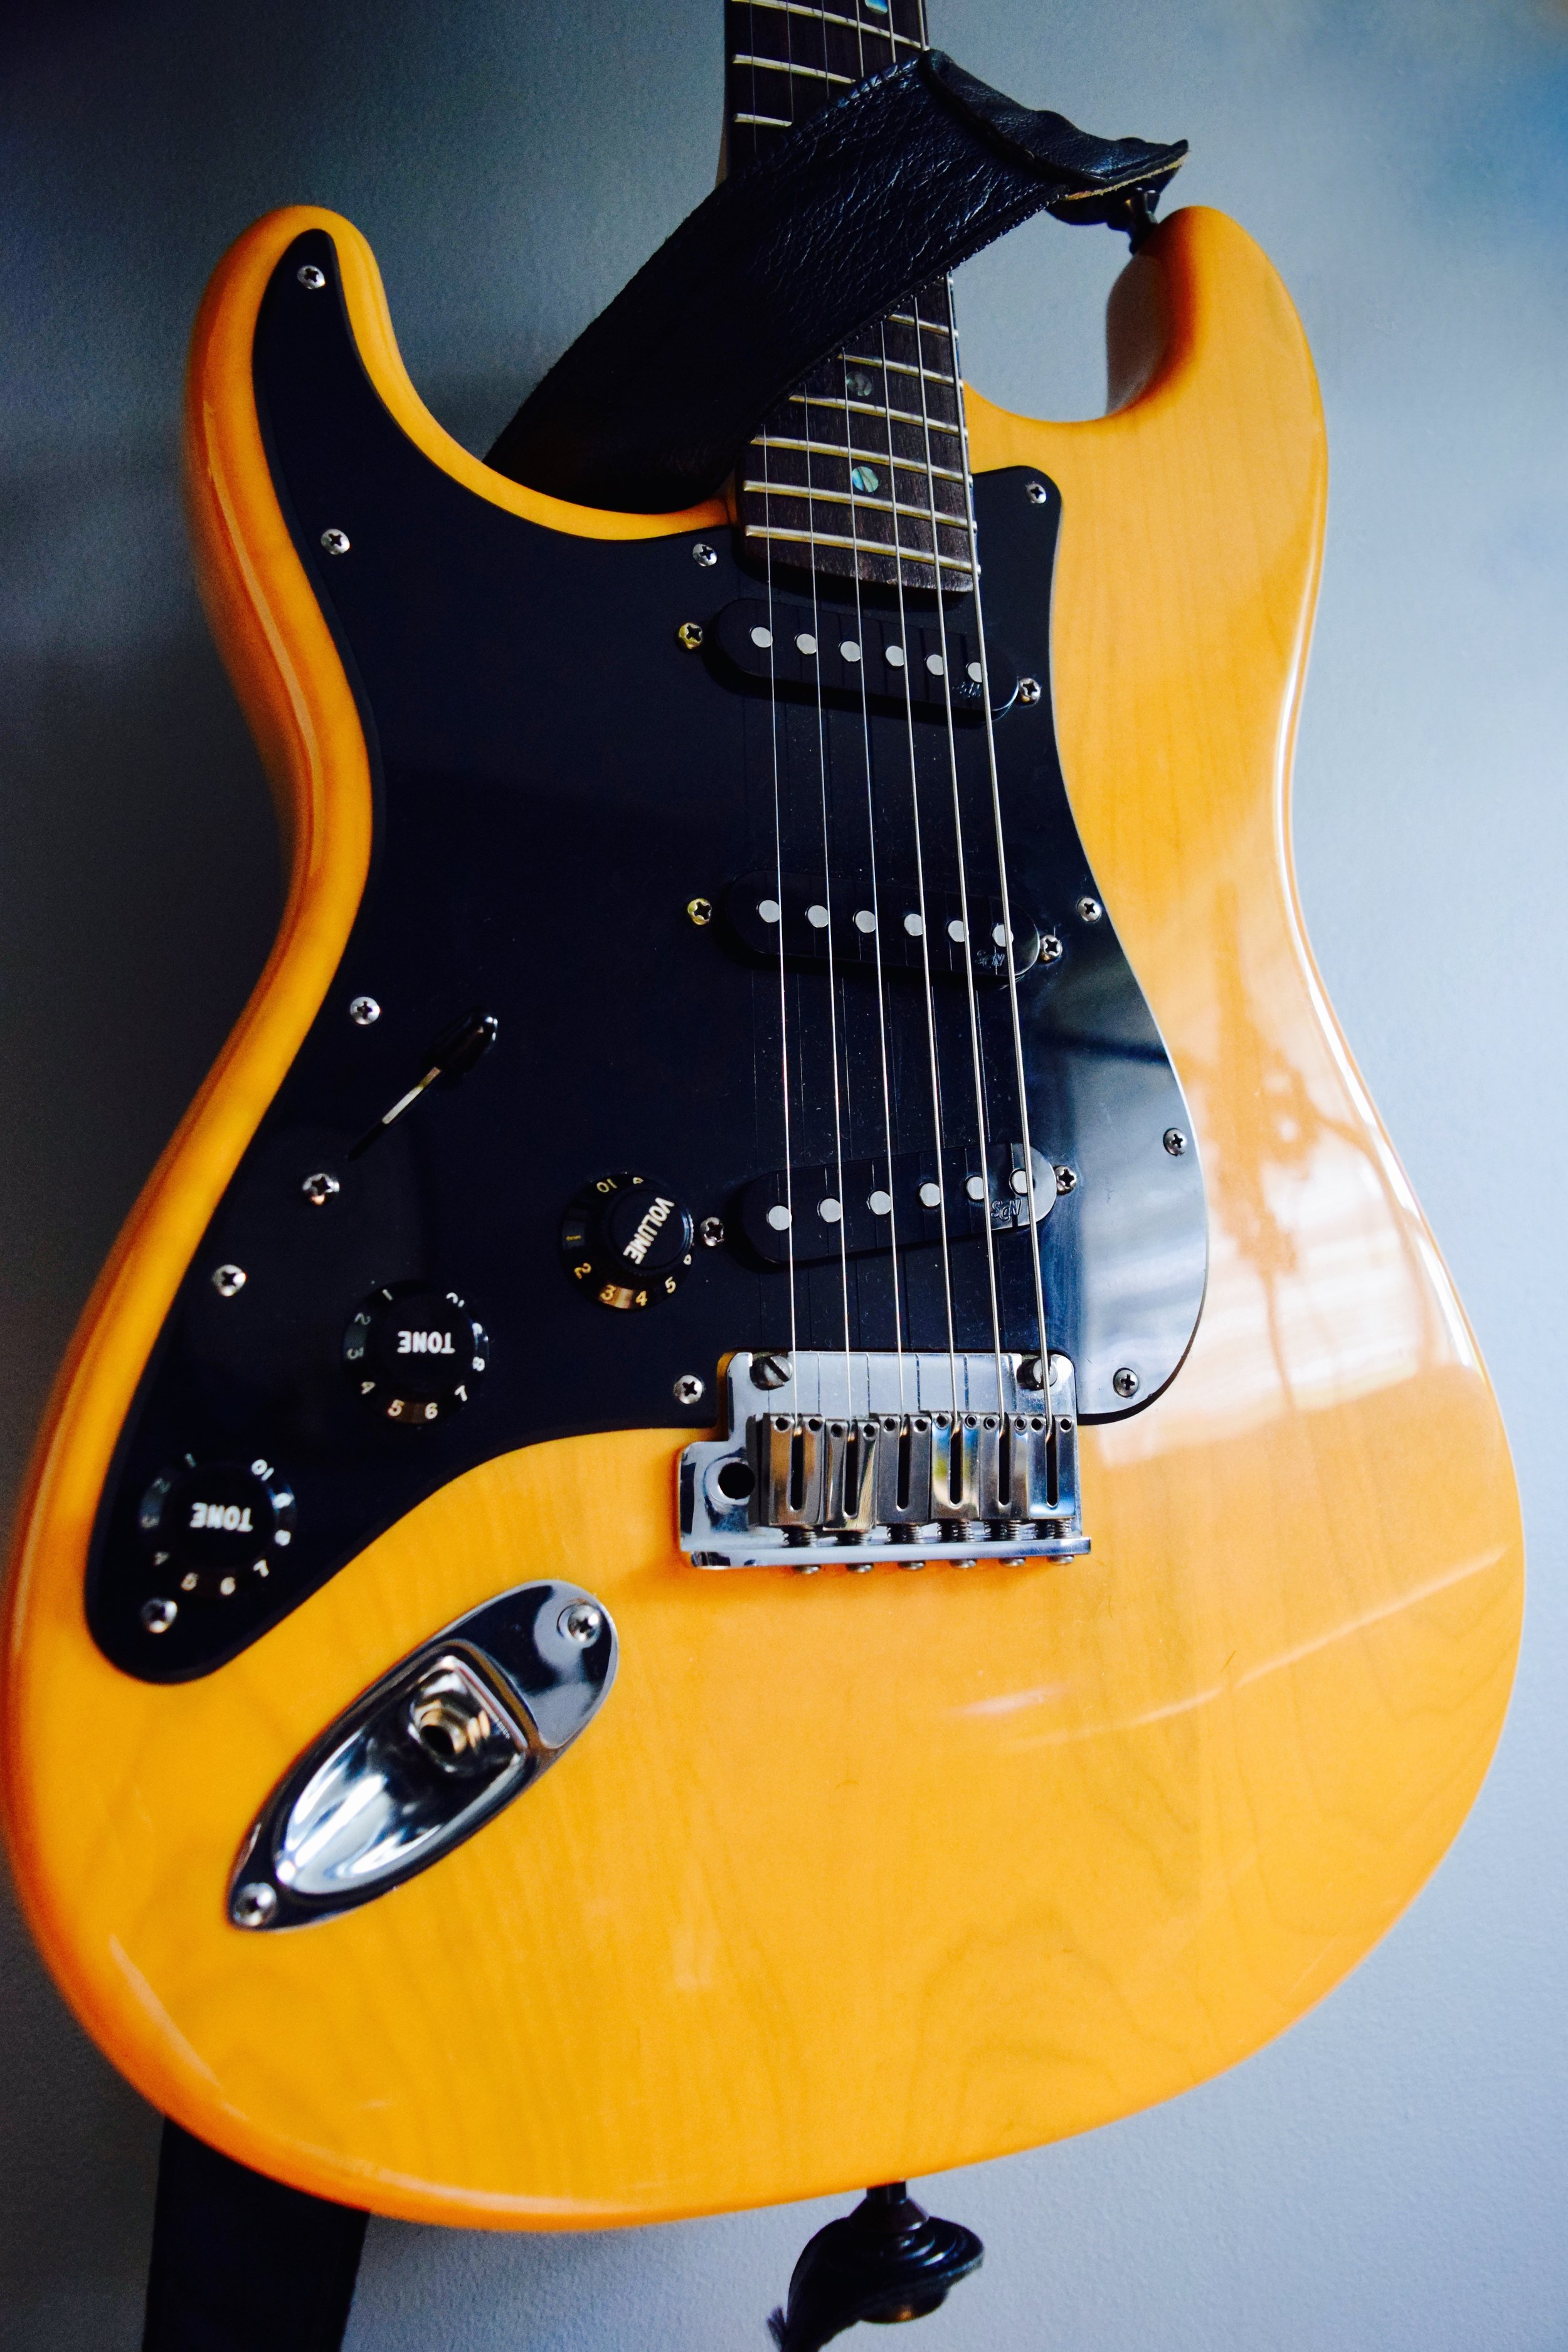 Fender Stratocaster 60th Anniversary, Justin Jon Studio Guitar Tracking